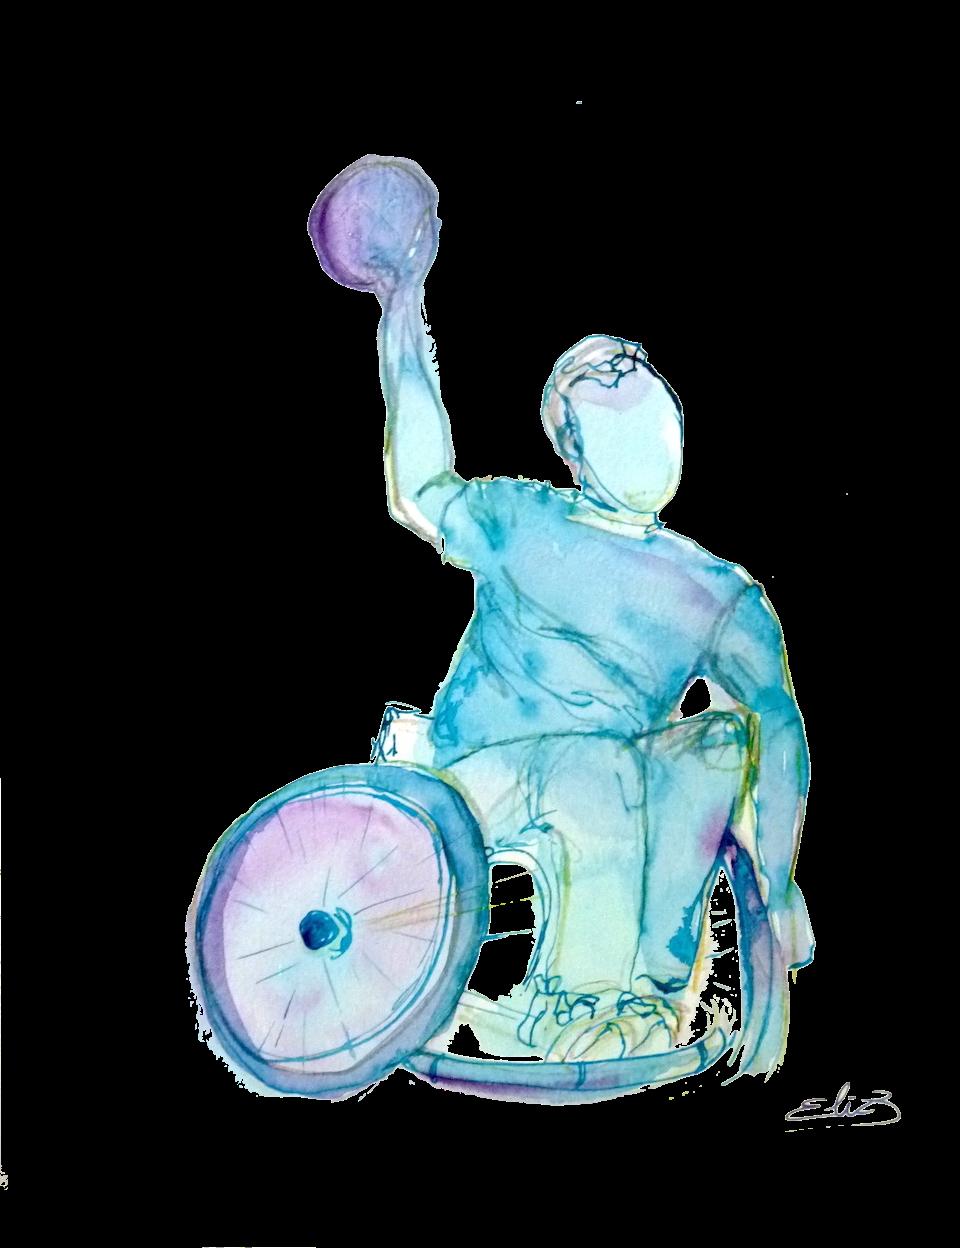 handball handisport fauteuil handicapé sport esquisse dessin pigmentropie Elize